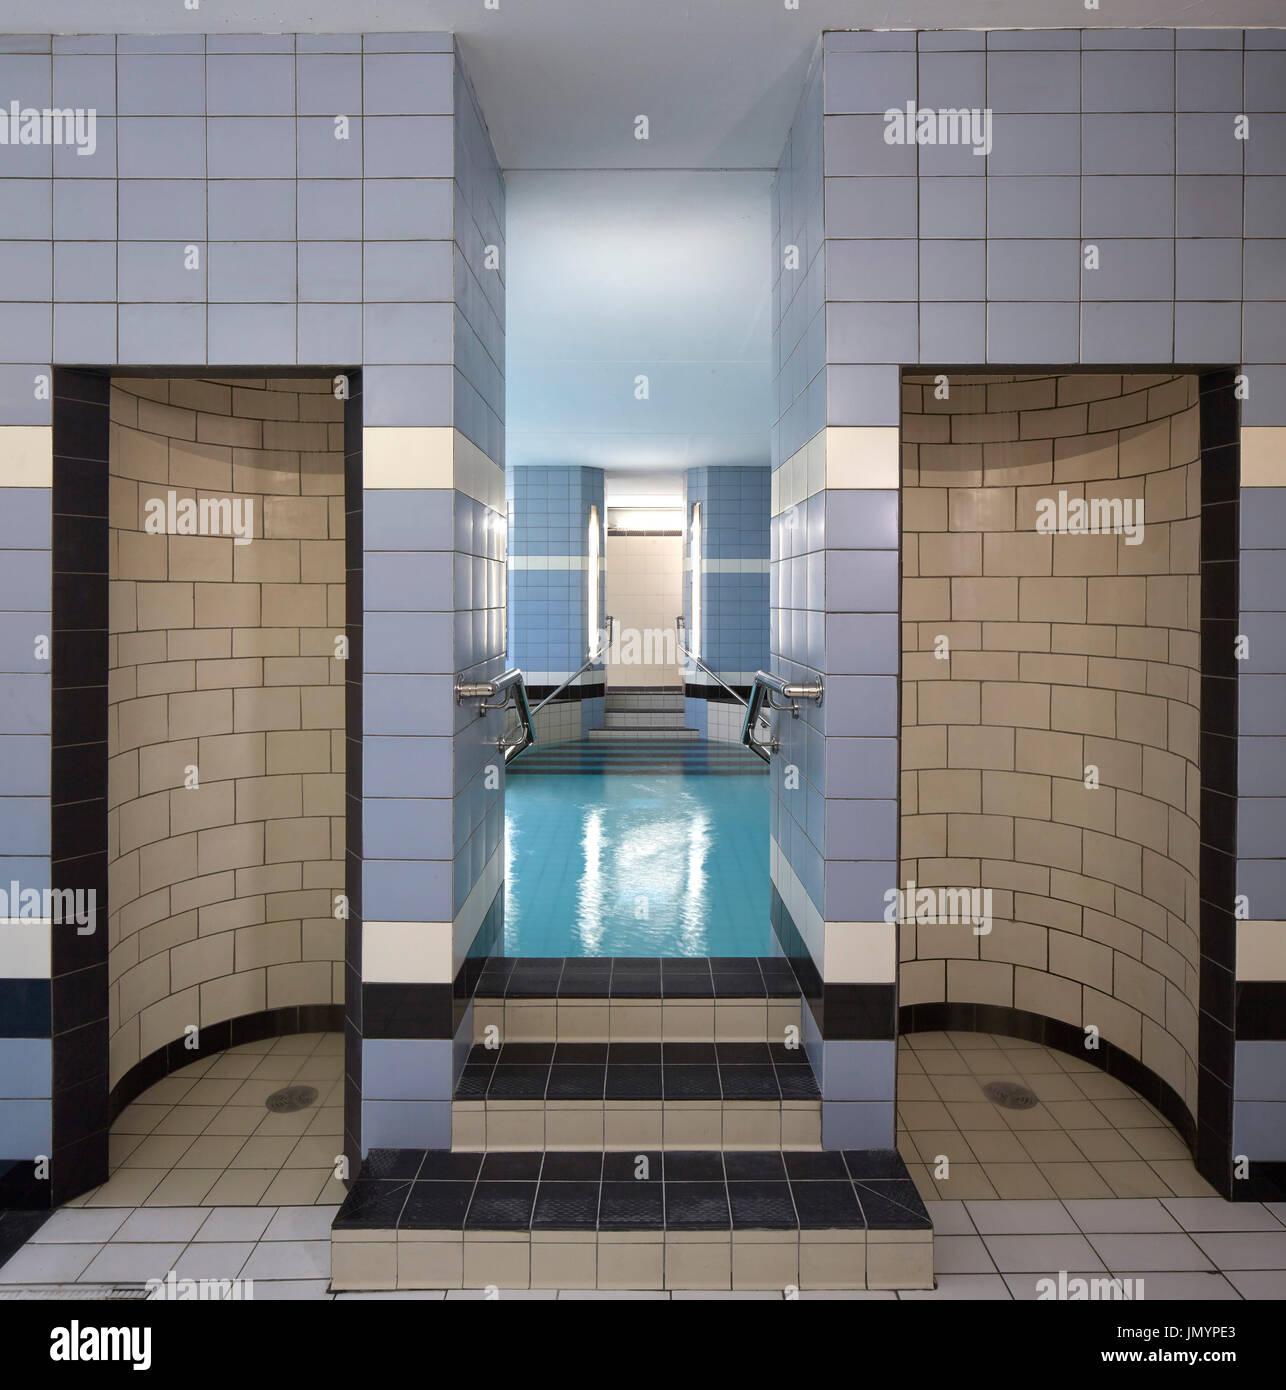 Pool in basement. Poplar Baths Leisure Centre, London, United Stock ...